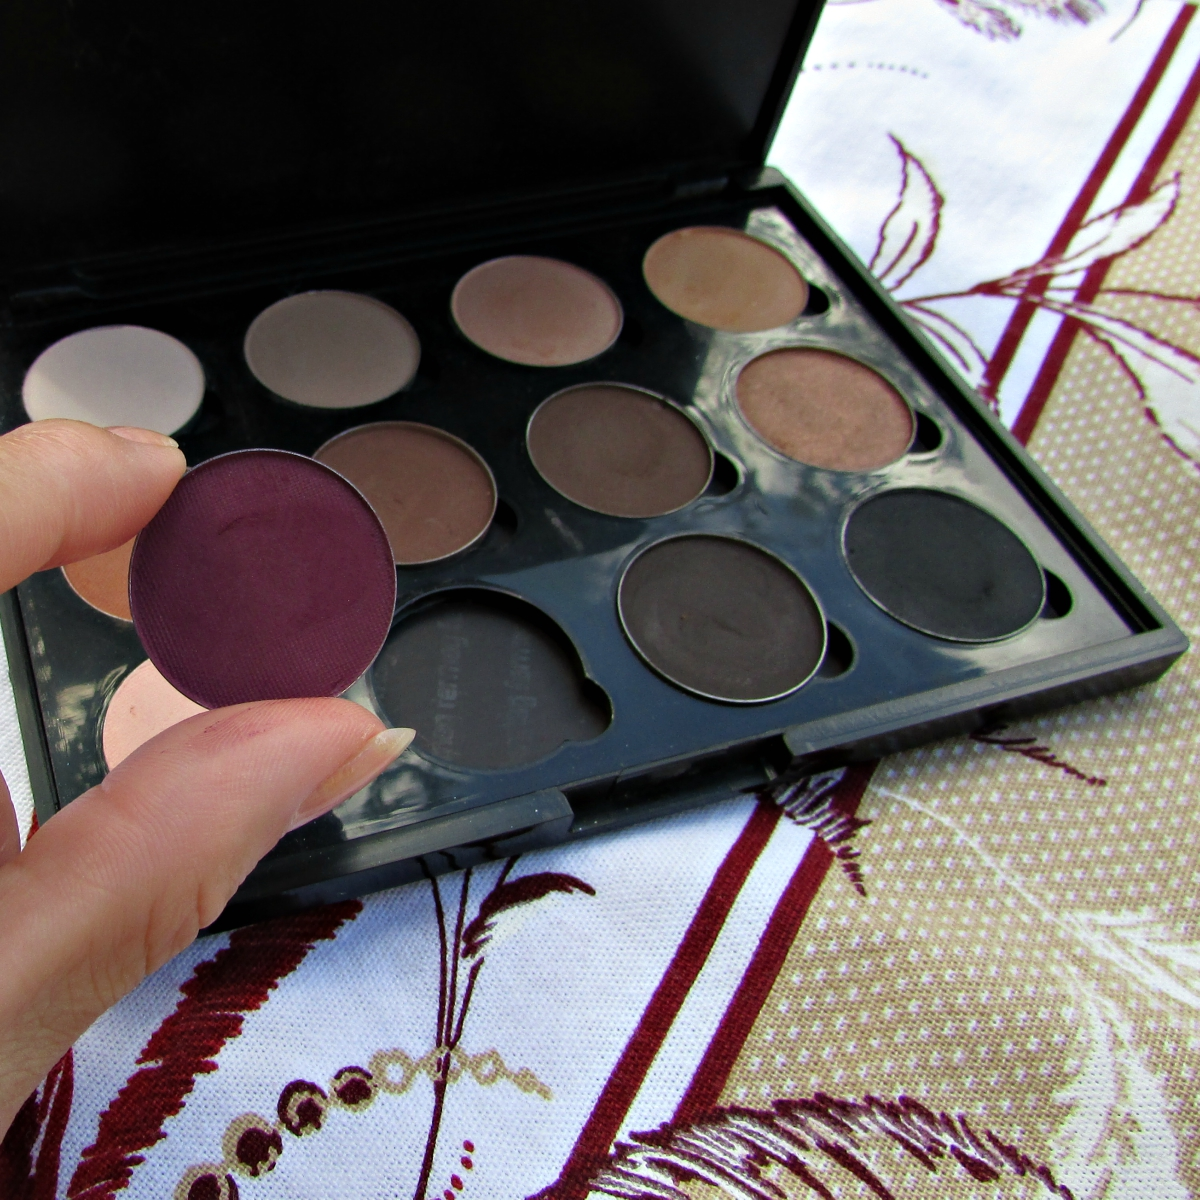 Paleta de sombras nudes perfeitos, paleta de sombra marrom opaca, sombra marrom terra.